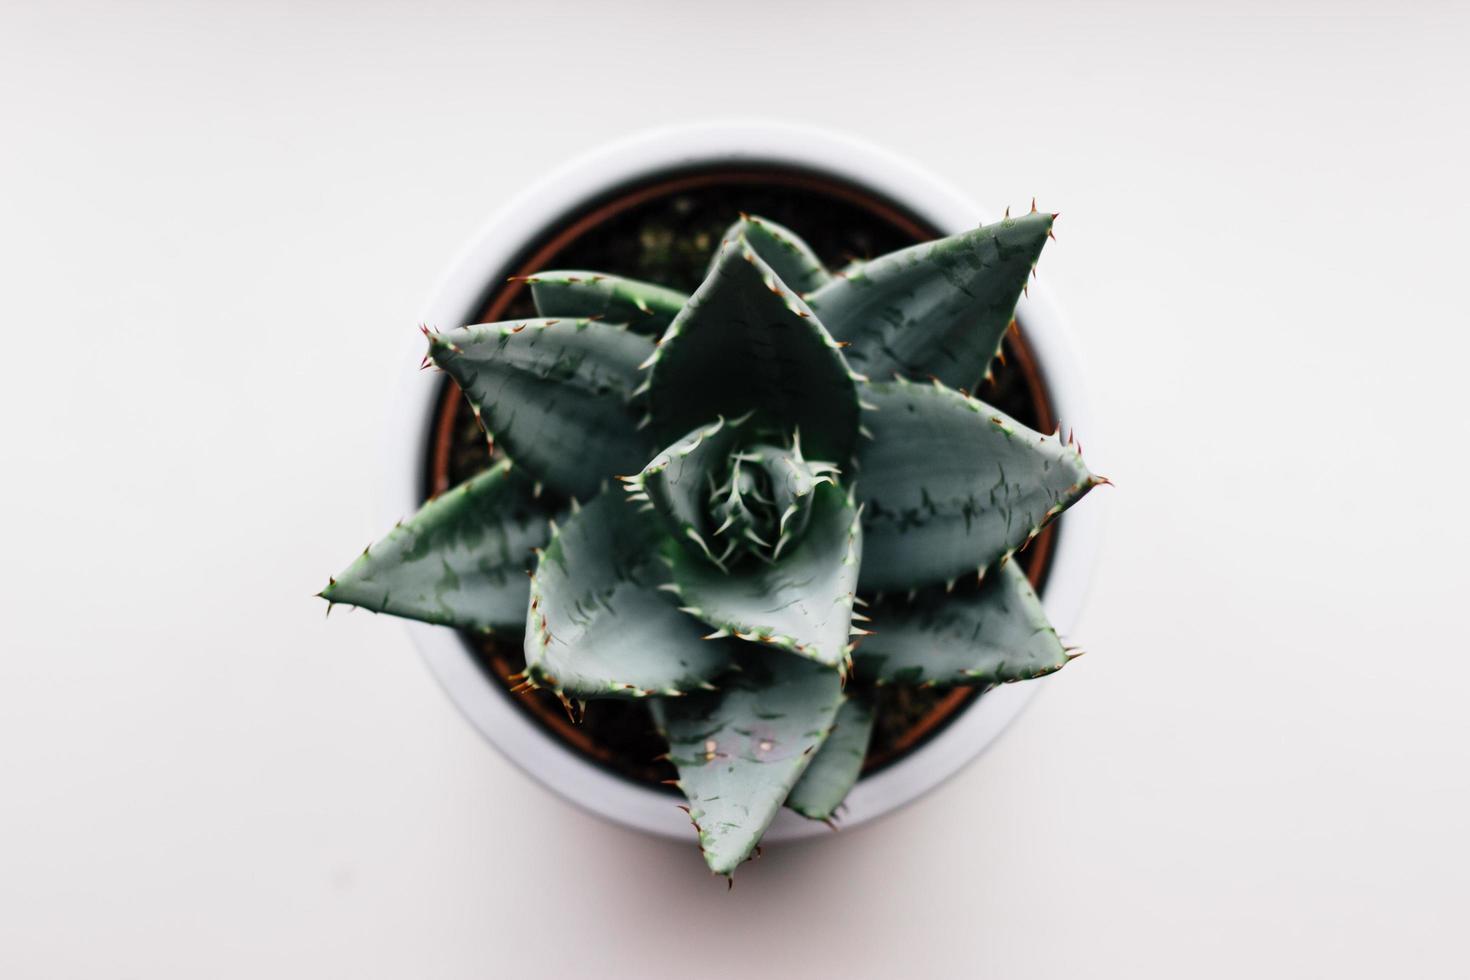 cactus vert sur fond blanc photo